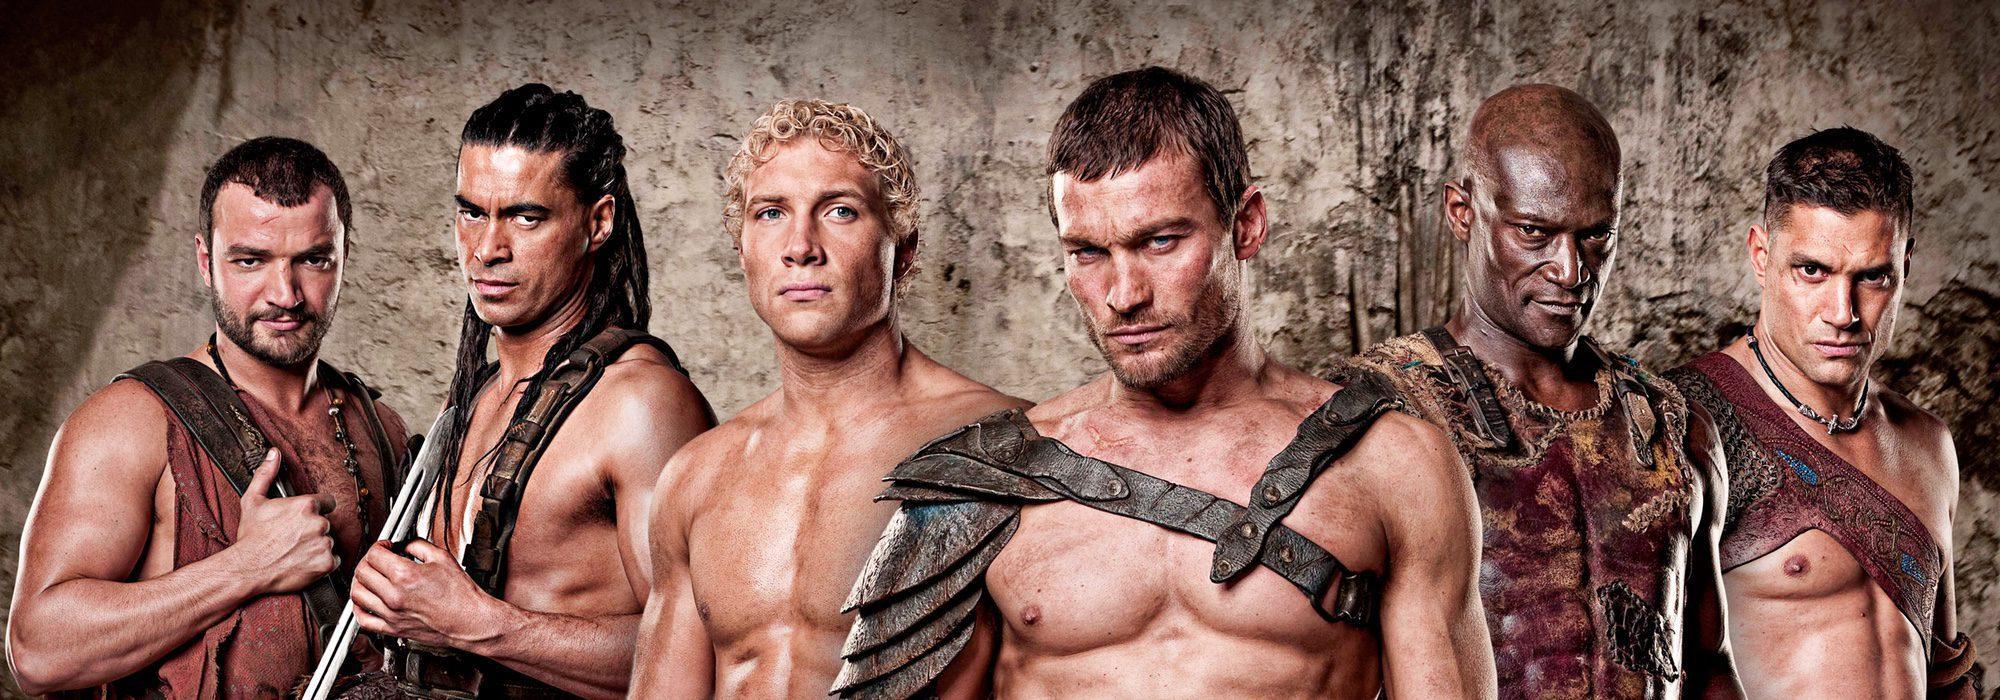 Spartacus dioses de la arena latino dating